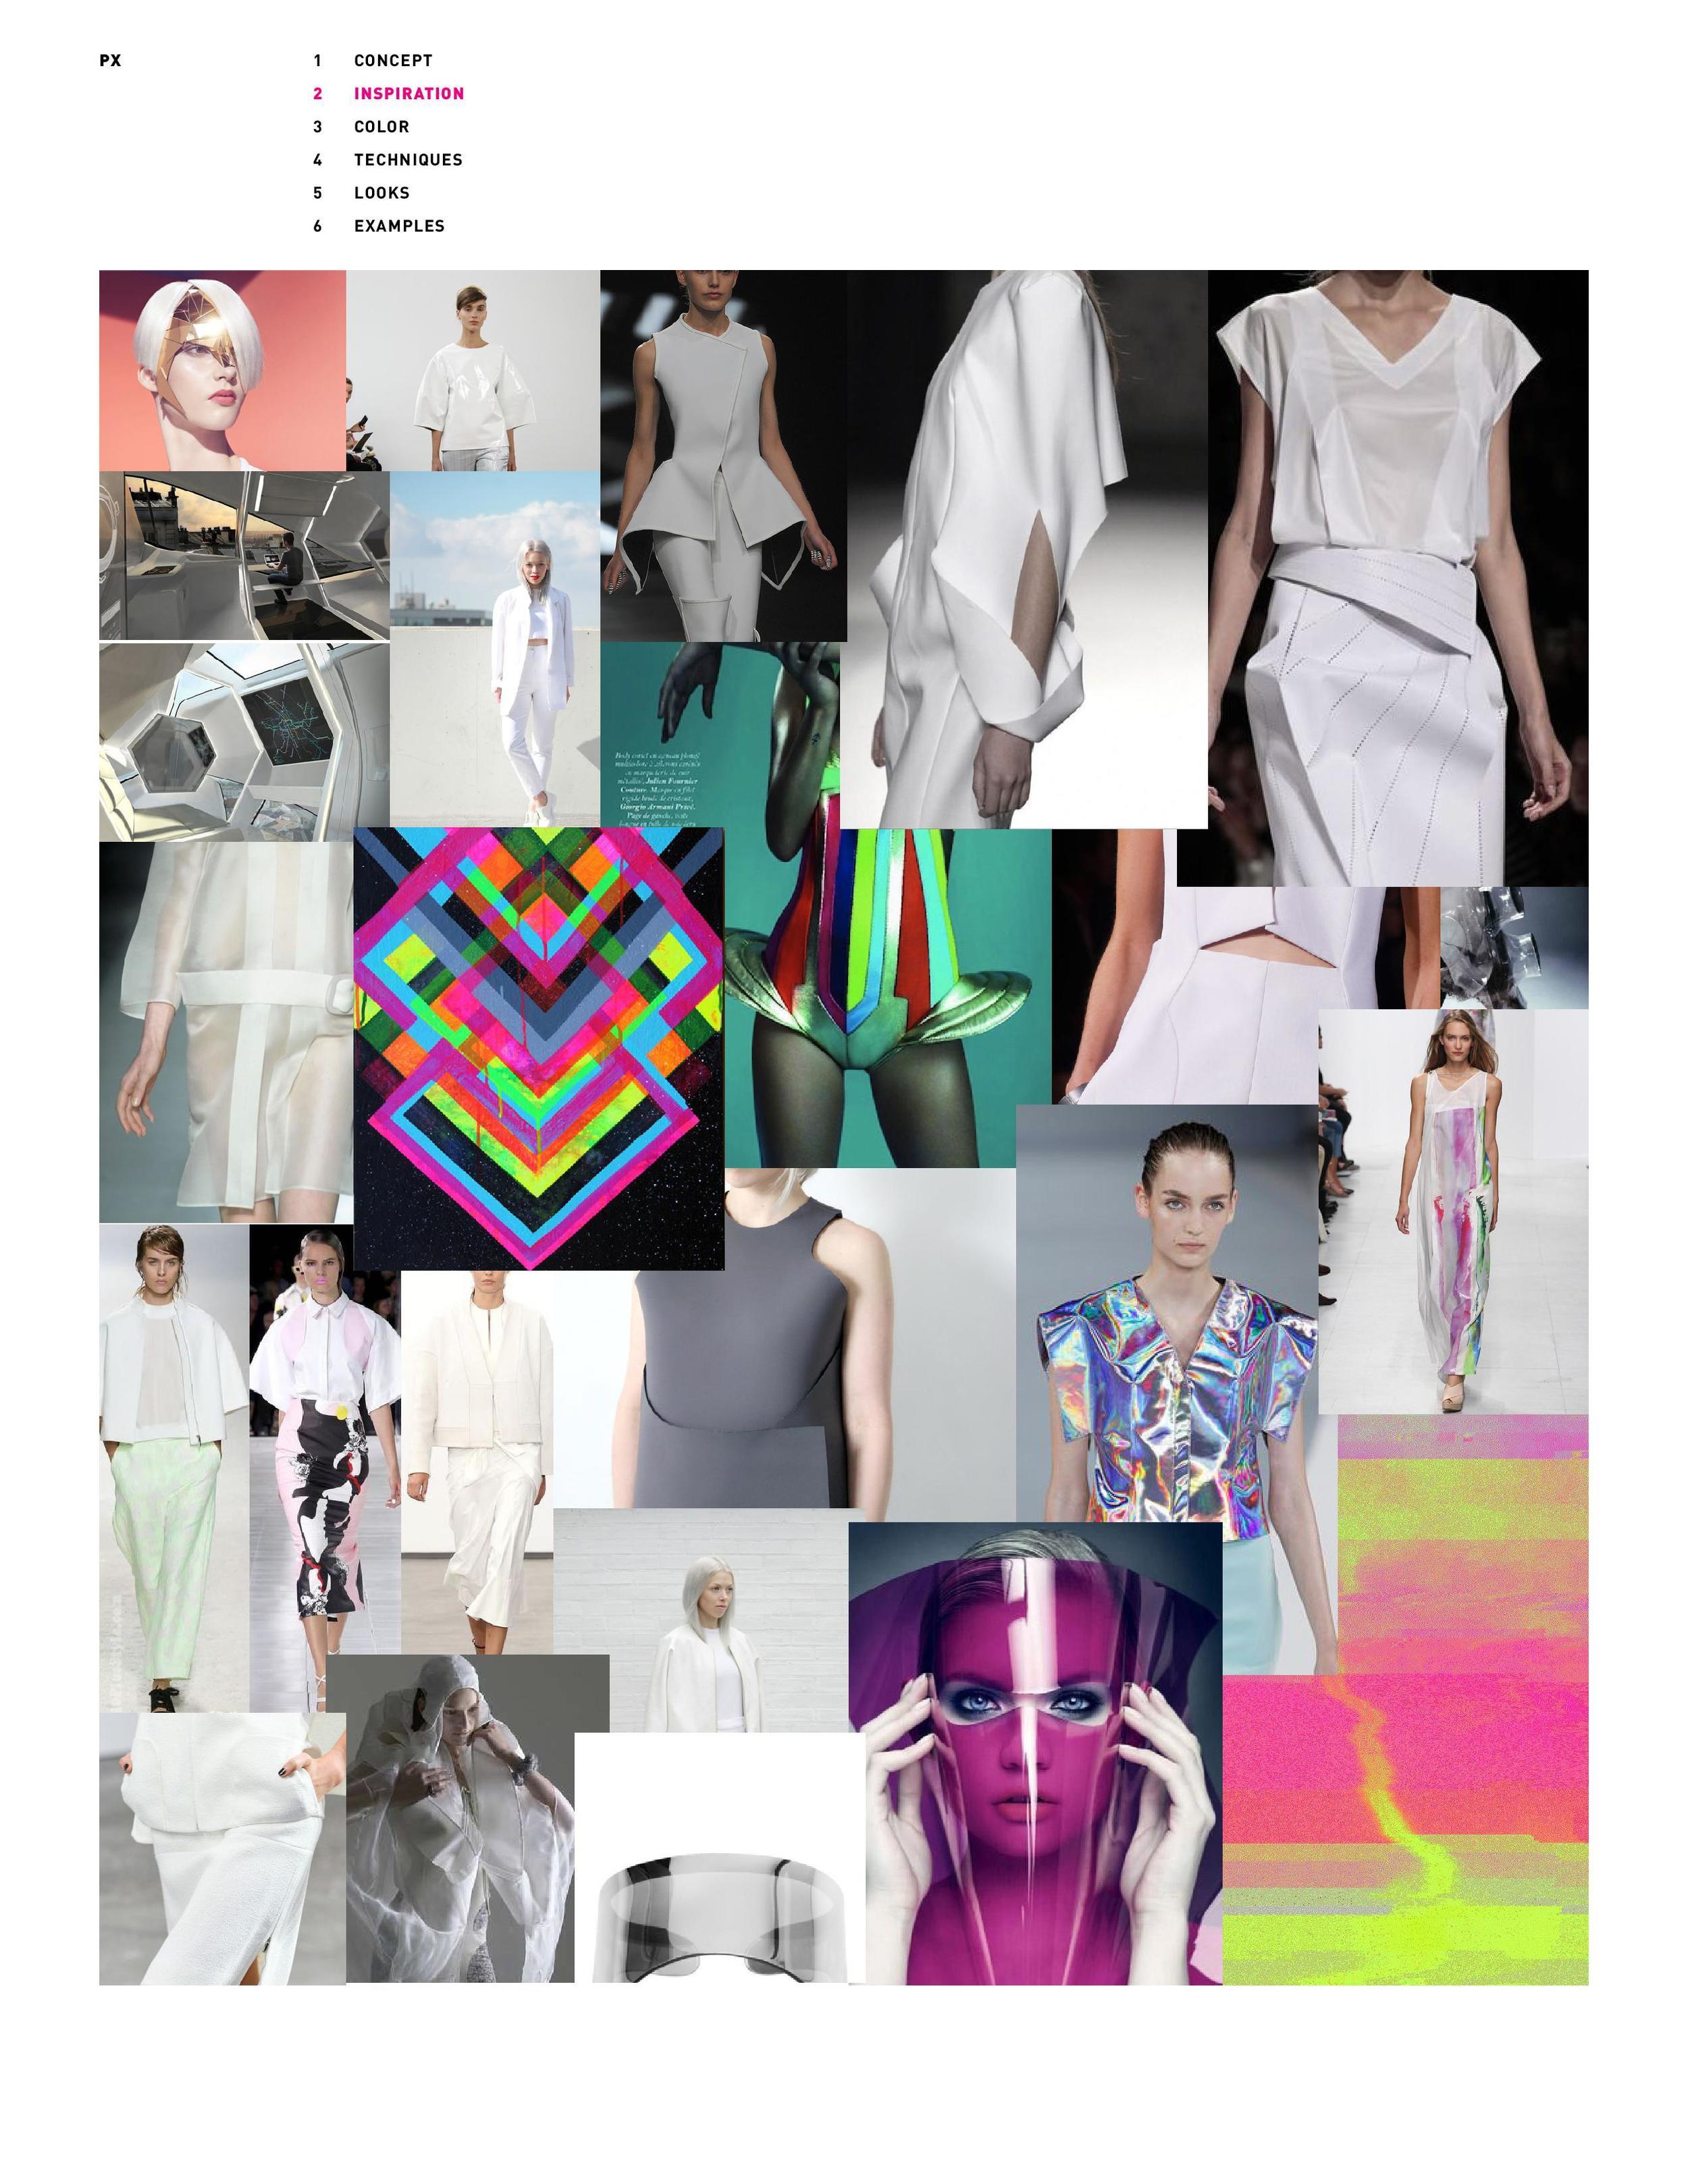 portfolio-02-page-003.jpg